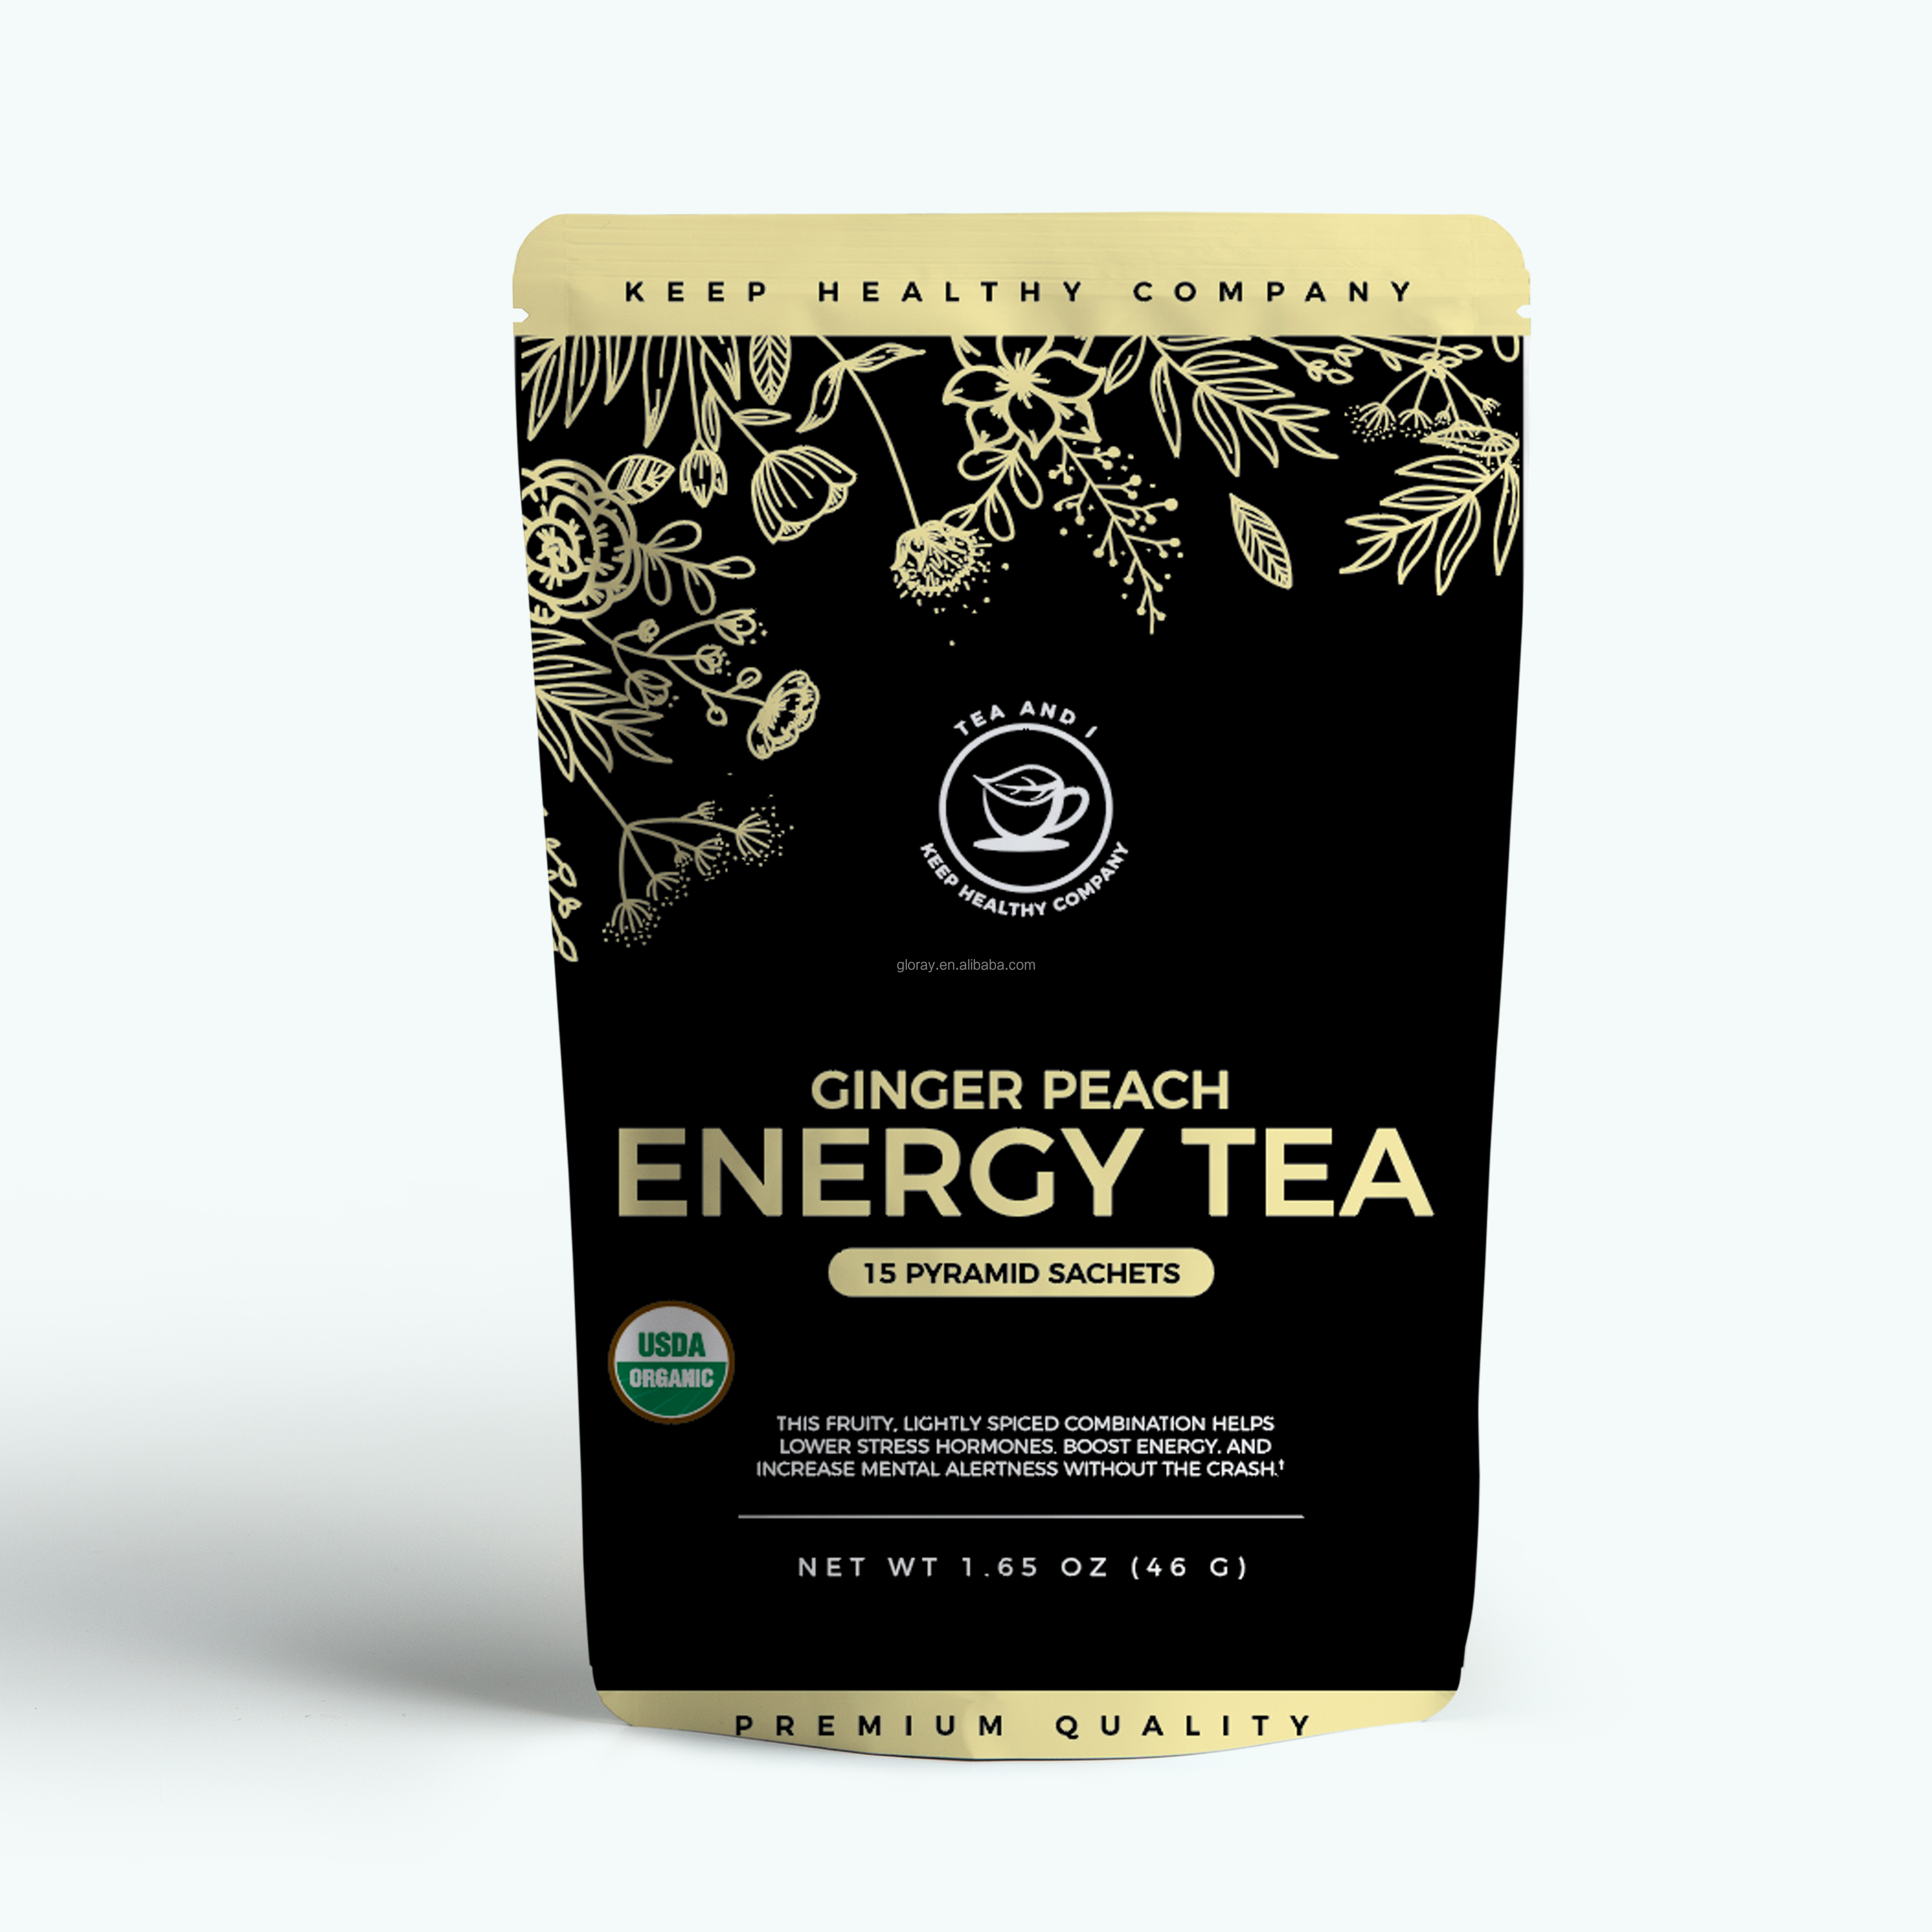 Detox Tea for Weight Loss and Belly Fat 14 Day Teatox Herbal Slim Tea for Body Detox - 4uTea | 4uTea.com